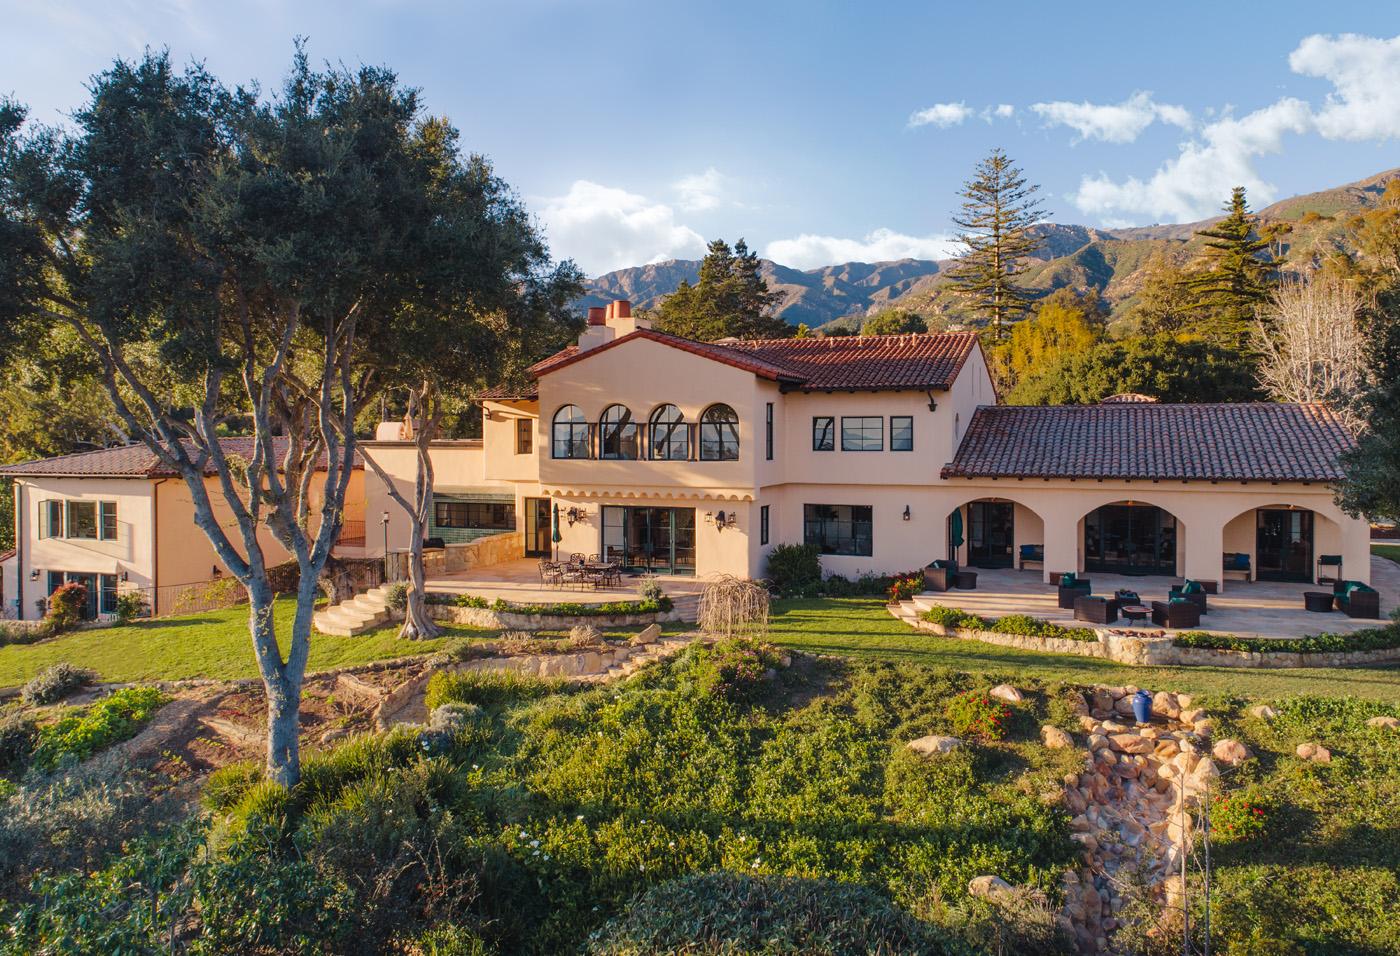 Property for Sale: 705 Riven Rock Road, Montecito, CA 93108 List Price: $14,900,000 9 Beds 9 Baths 2 Half Baths 10,044 Sq Ft Main House La Manzanita Estate!